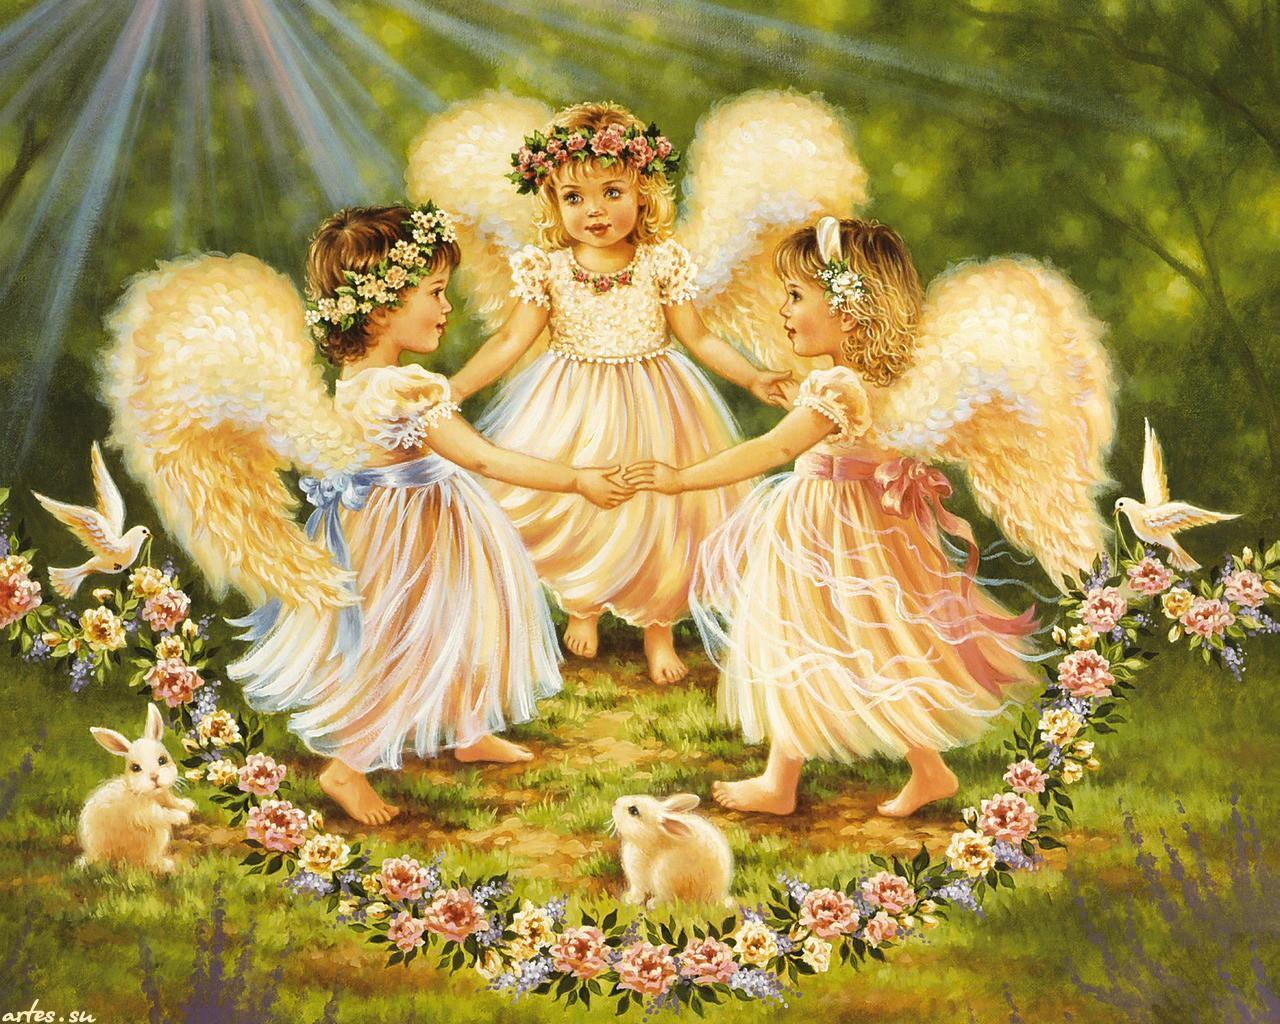 http://1.bp.blogspot.com/-nxML_KMa4ik/ULfIb_CZytI/AAAAAAAADKQ/79LI63cPR8Y/s1600/dancing+angel+Wallpaper__yvt2.jpg